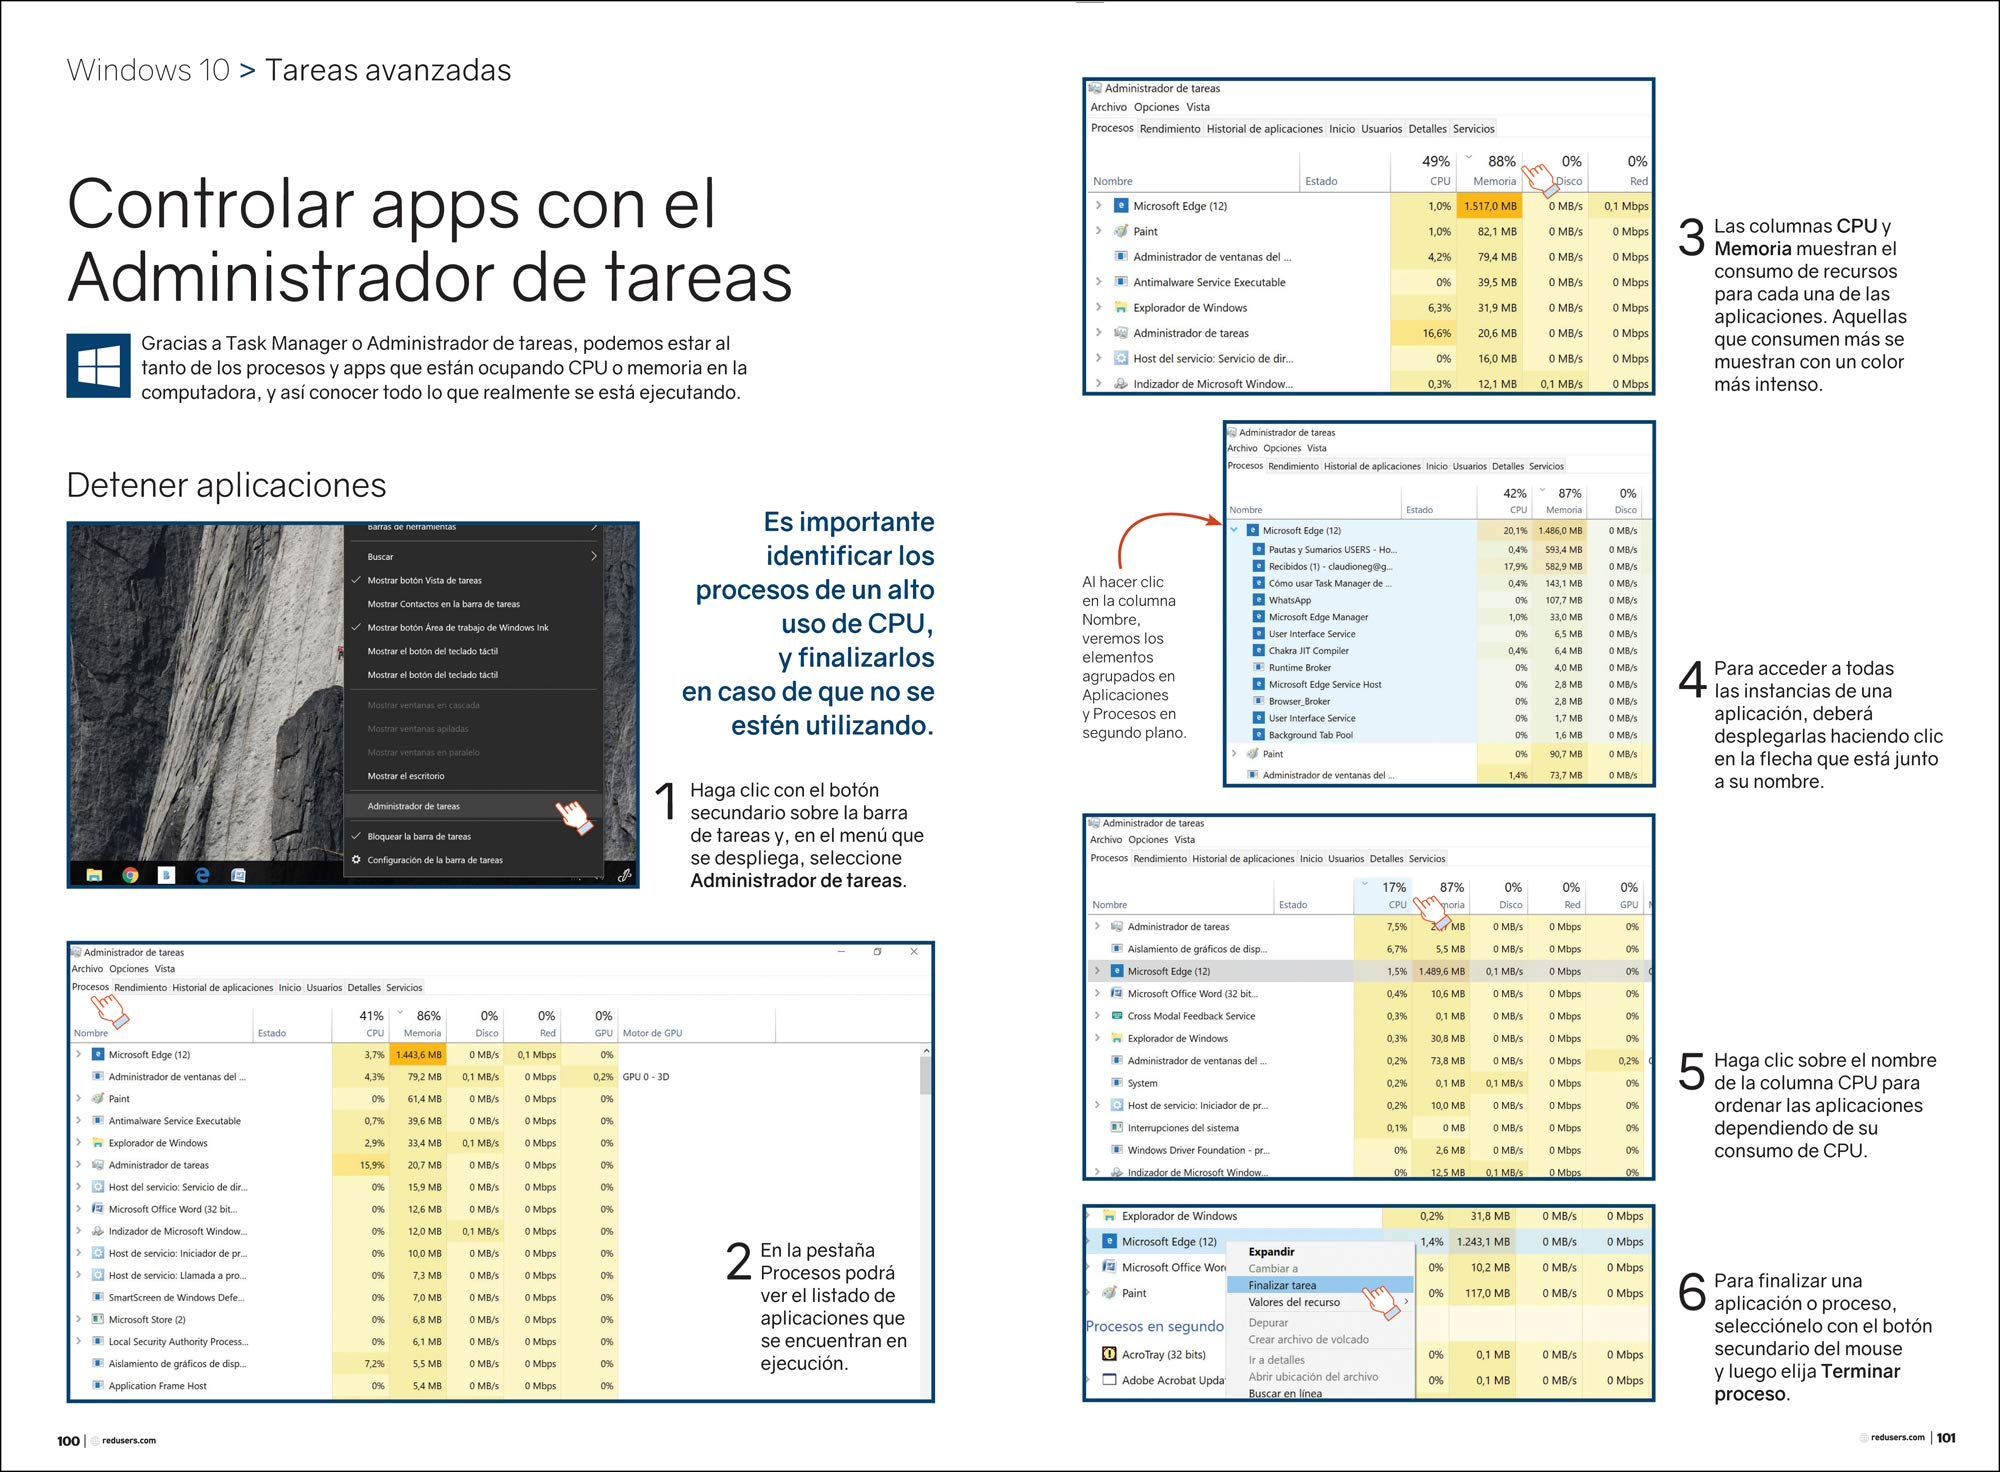 Windows 10 - Guía Práctica (Spanish Edition): Staff Users, USERS, Español Espanol Espaniol: 9789874958006: Amazon.com: Books